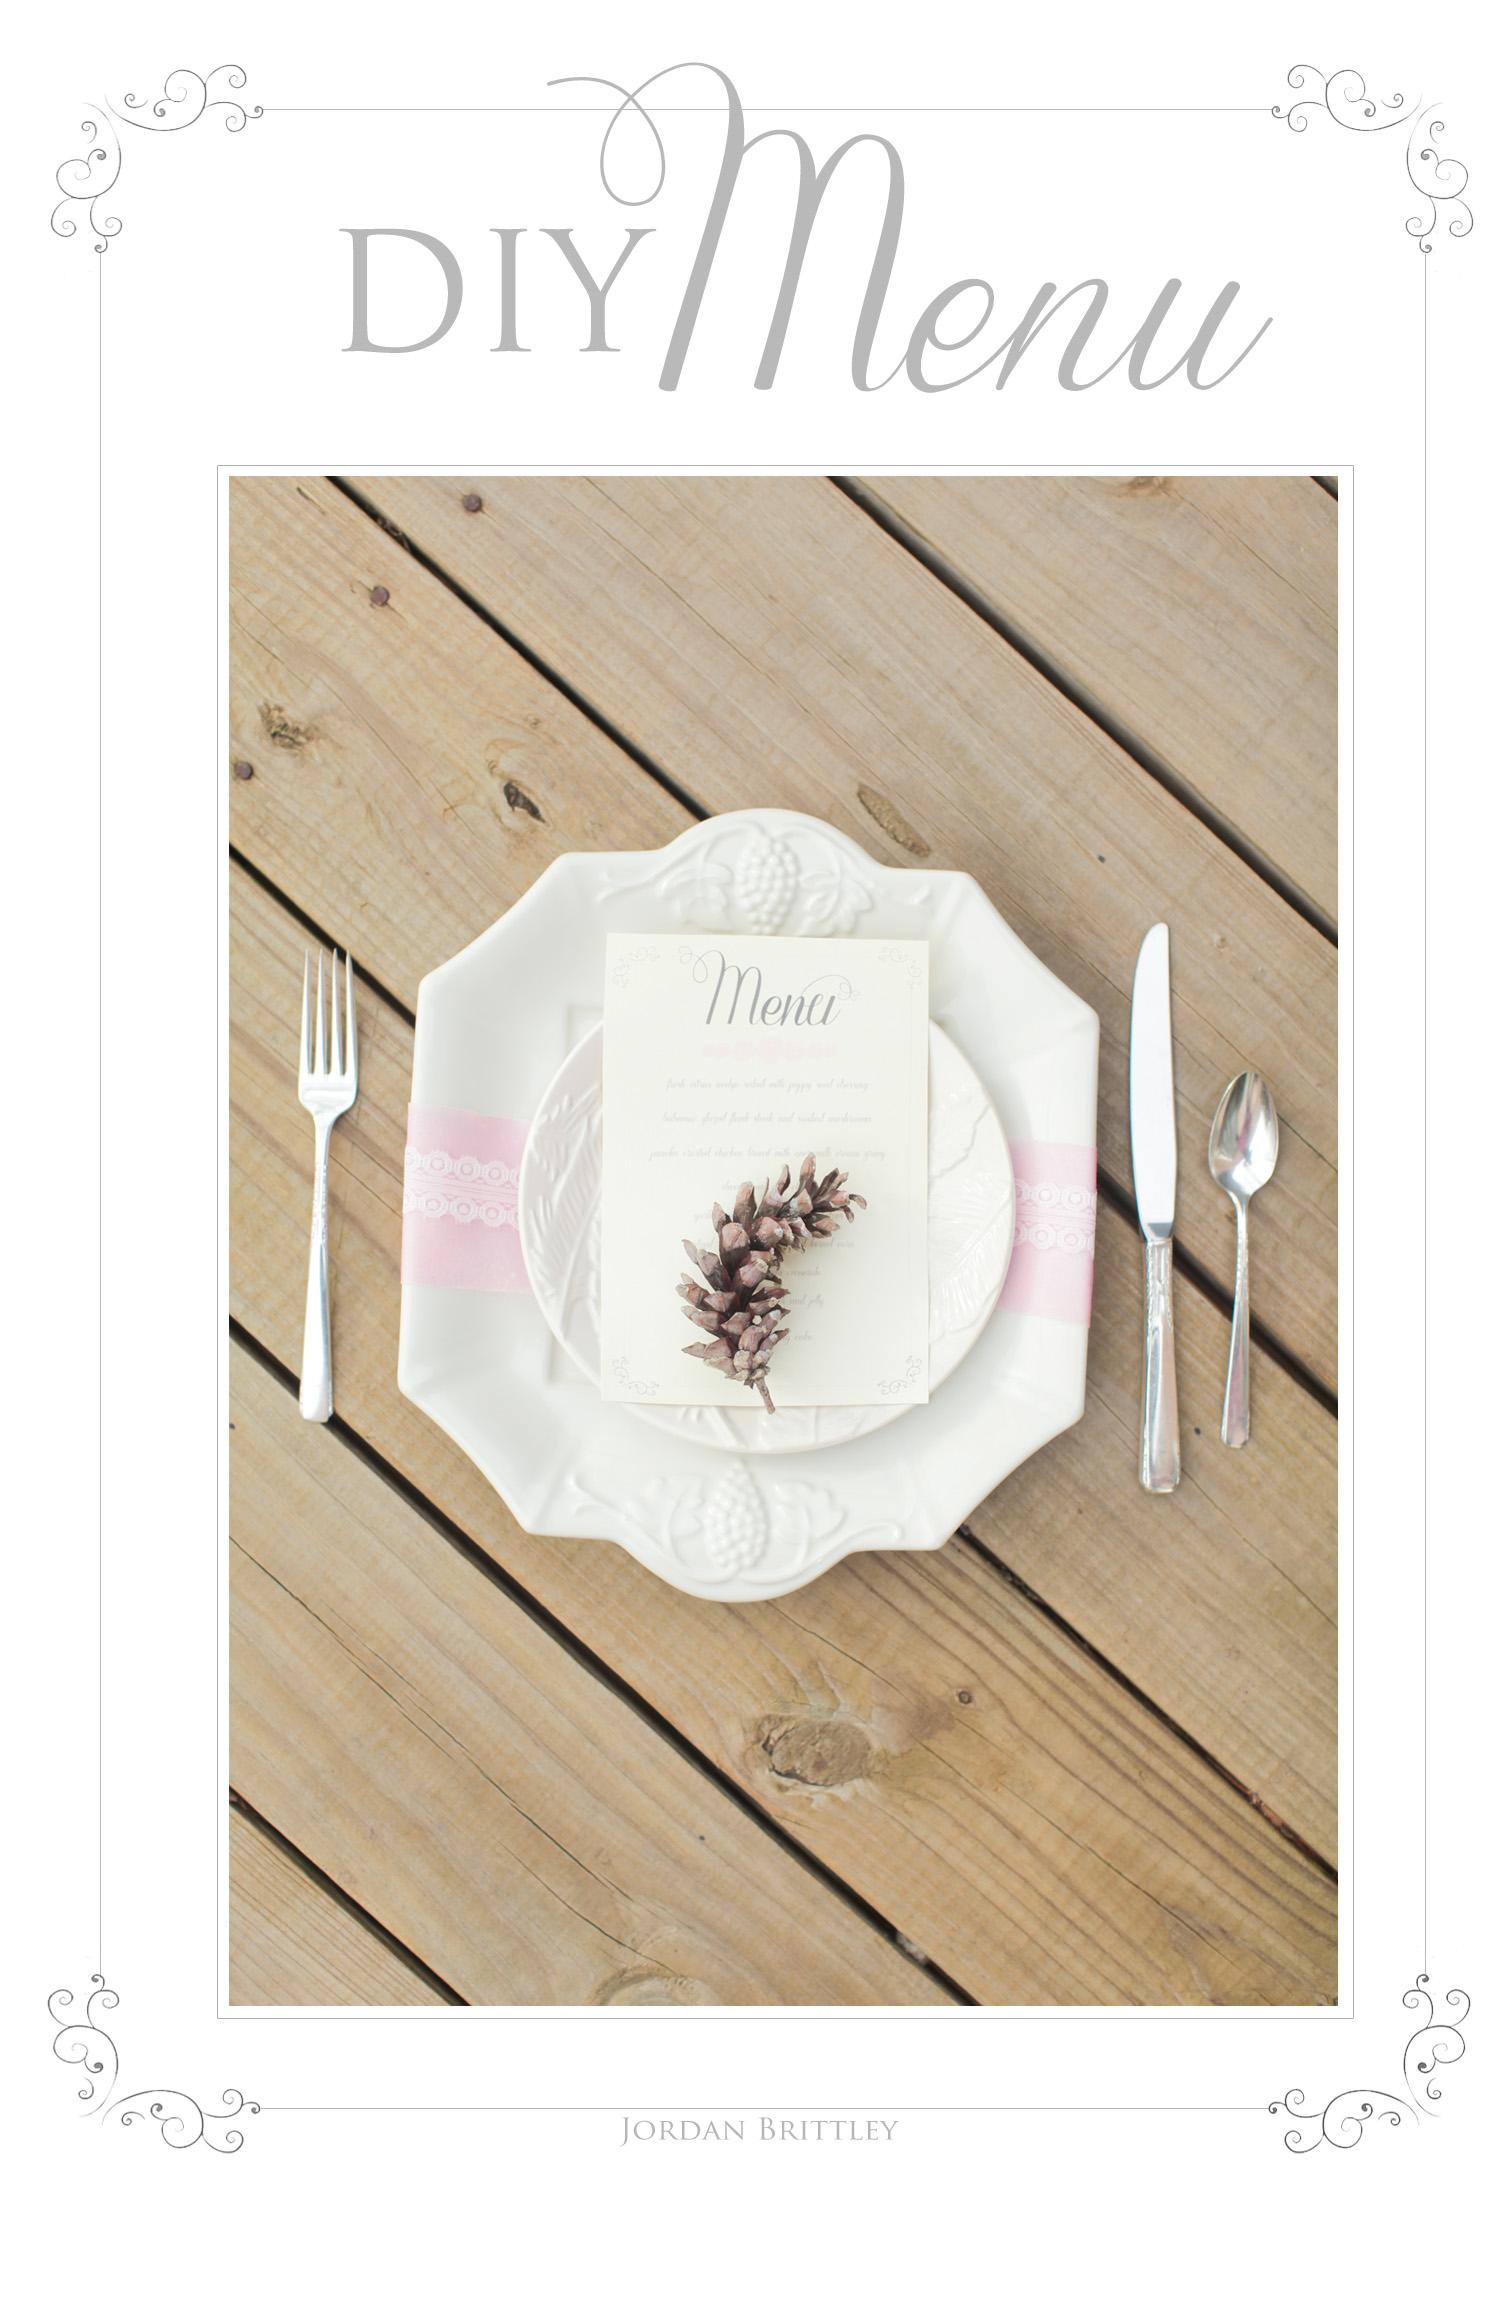 DIY Menu - Wedding Menu by Jordan Brittley